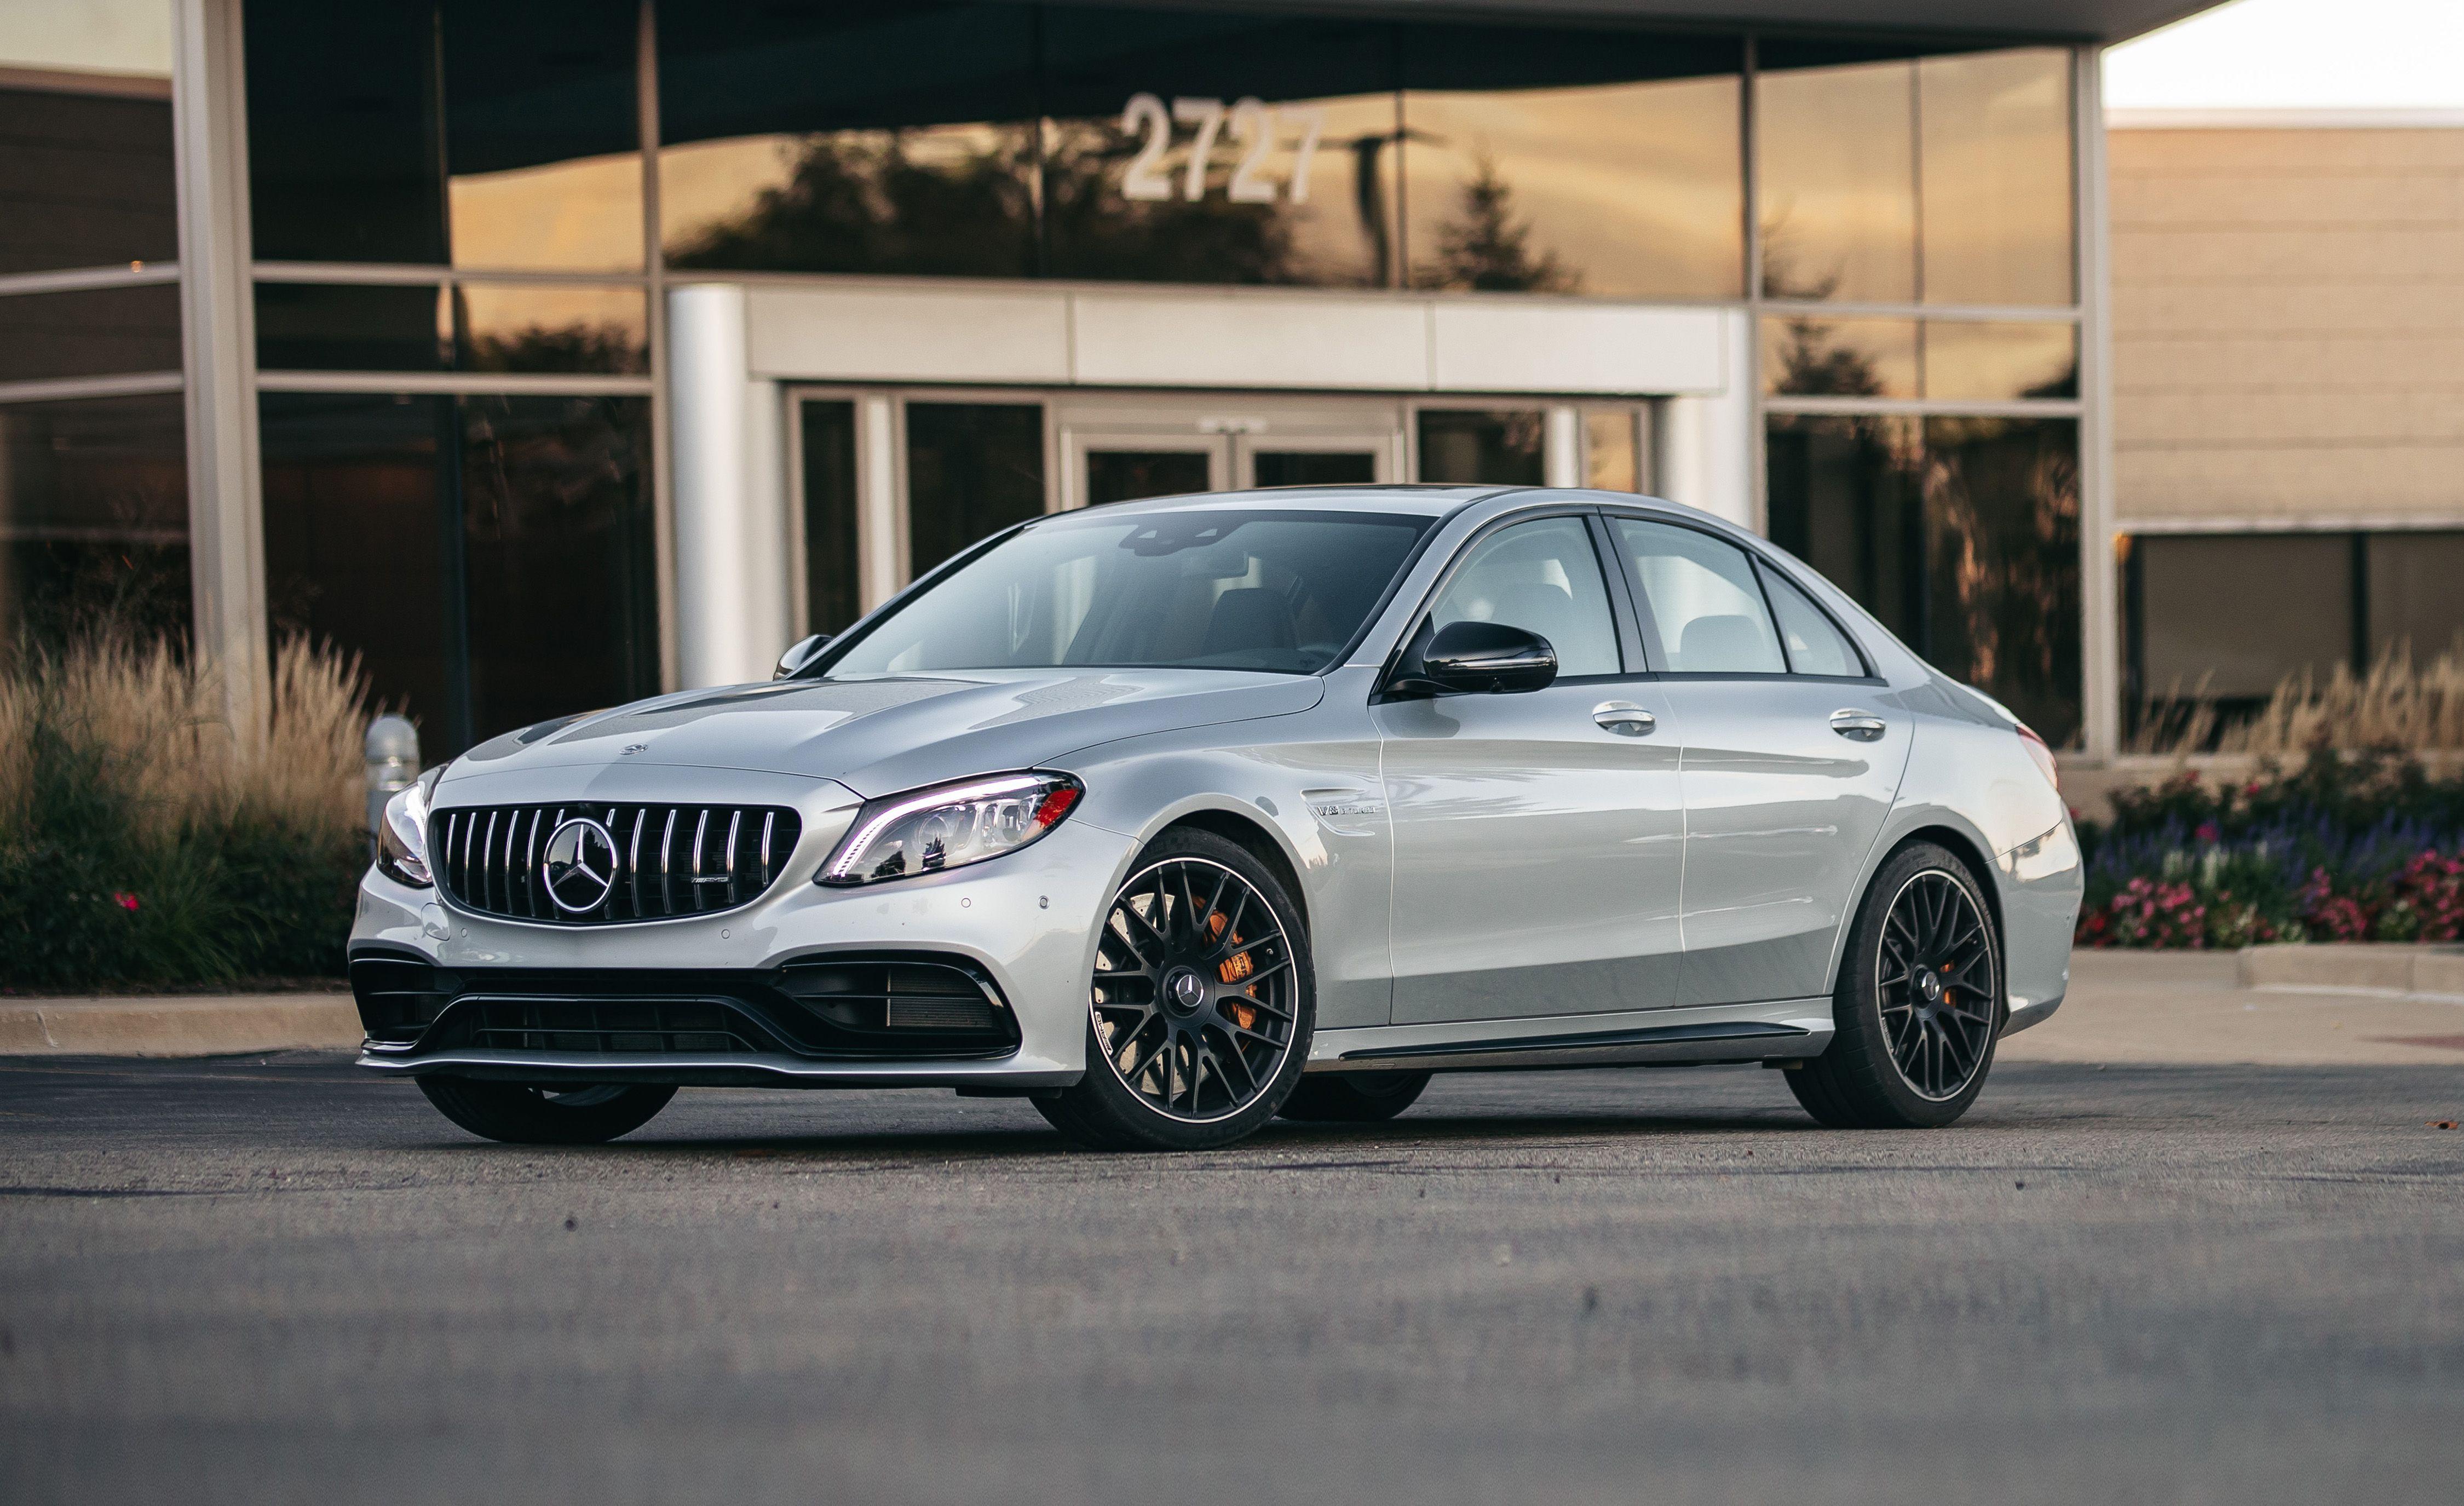 Mercedes Benz Silver Lightning Price >> 2019 Mercedes-AMG C63 Reviews | Mercedes-AMG C63 Price ...